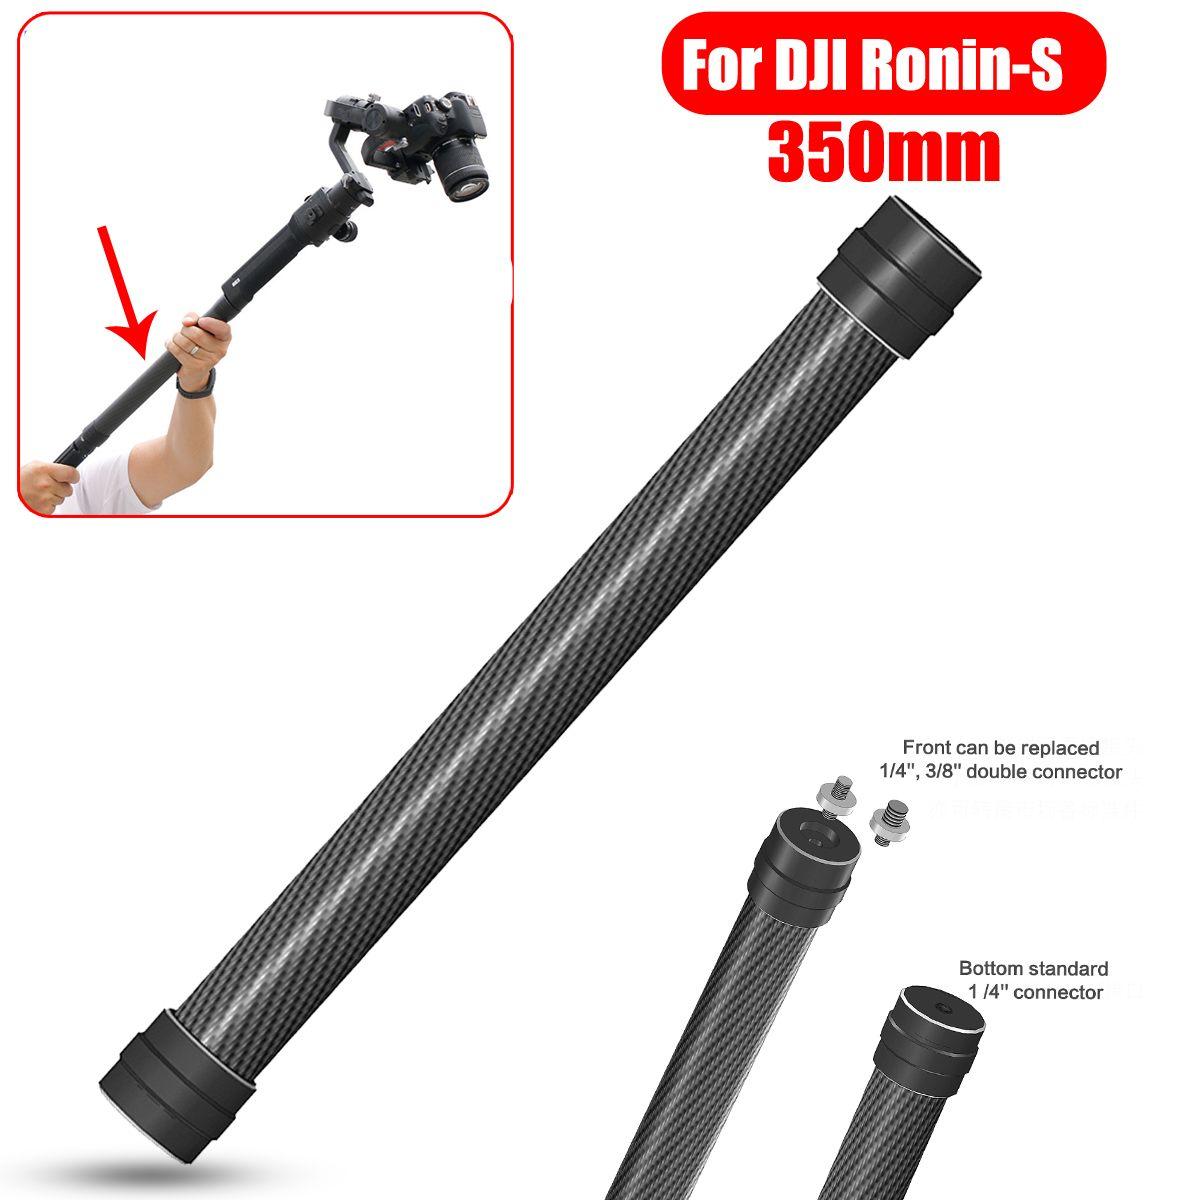 Palo de extensión de fibra de carbono profesional 1/4 3/8 varilla estabilizadora de rosca monopié para DJI Ronin S accesorio de cardán de mano